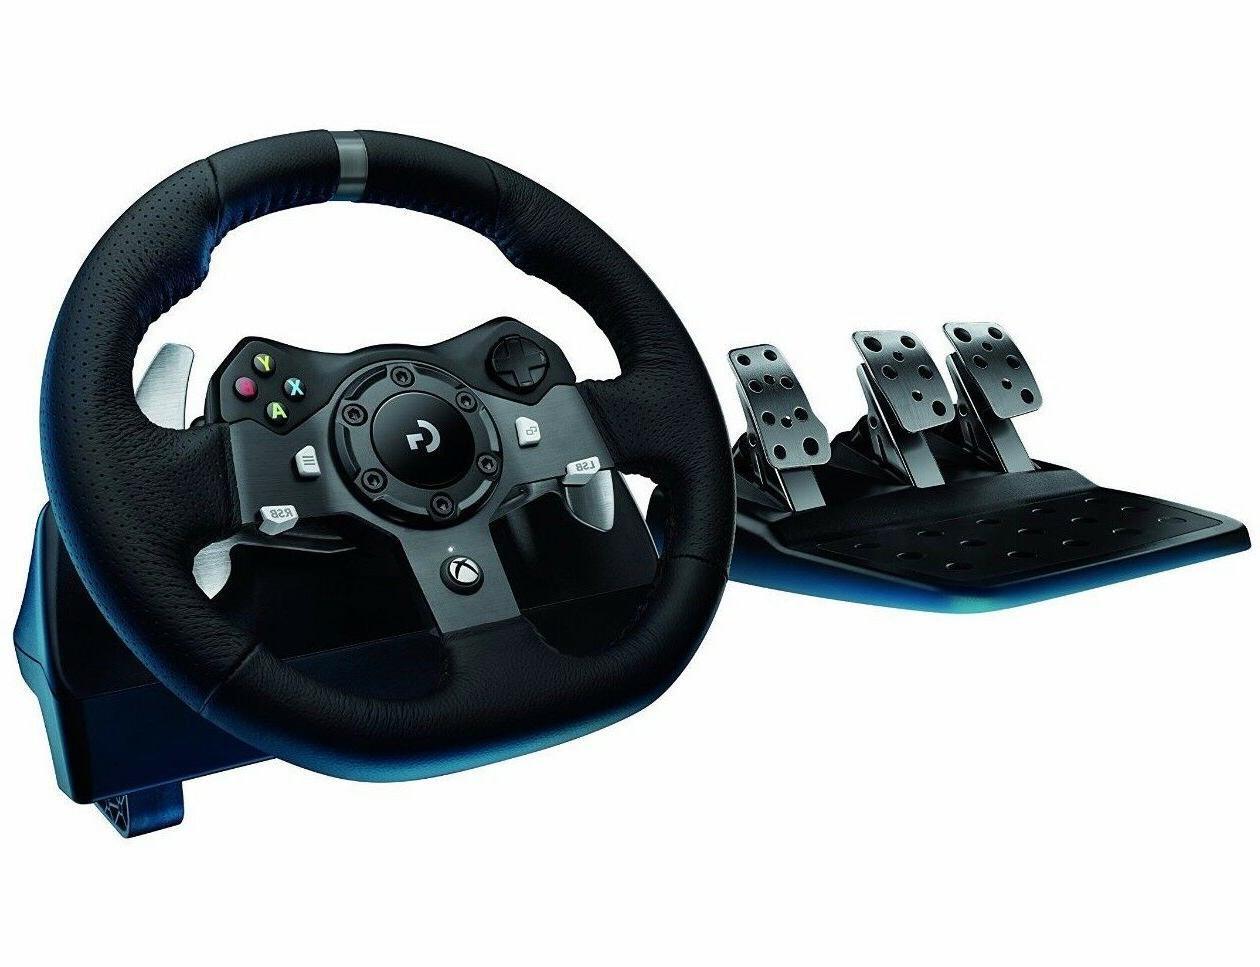 logitech g920 driving force racing steering wheel. Black Bedroom Furniture Sets. Home Design Ideas